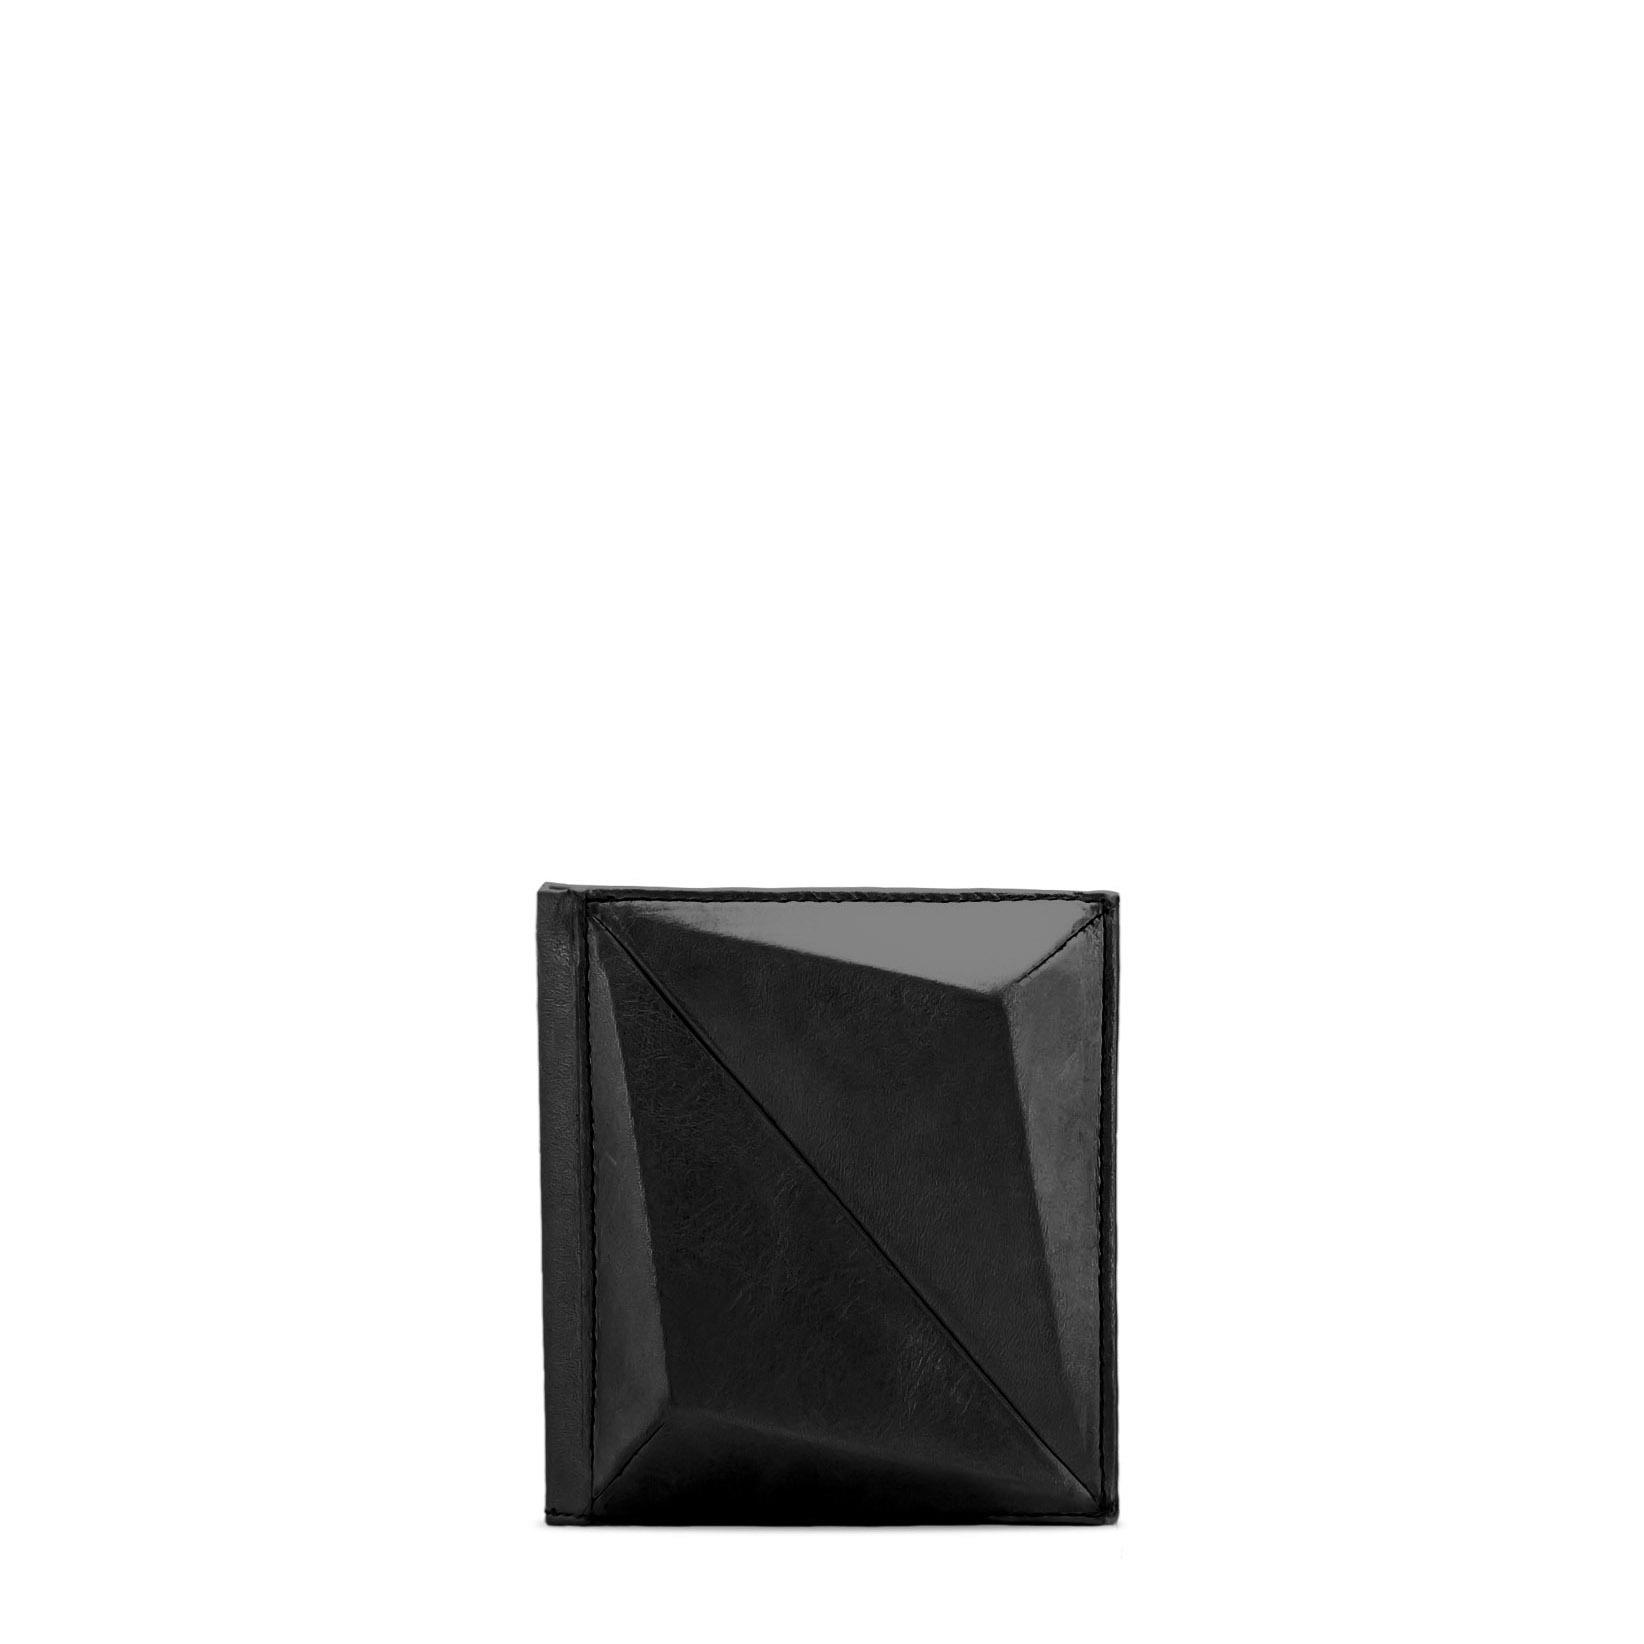 arutti_london_street_purse_black_beauty_2